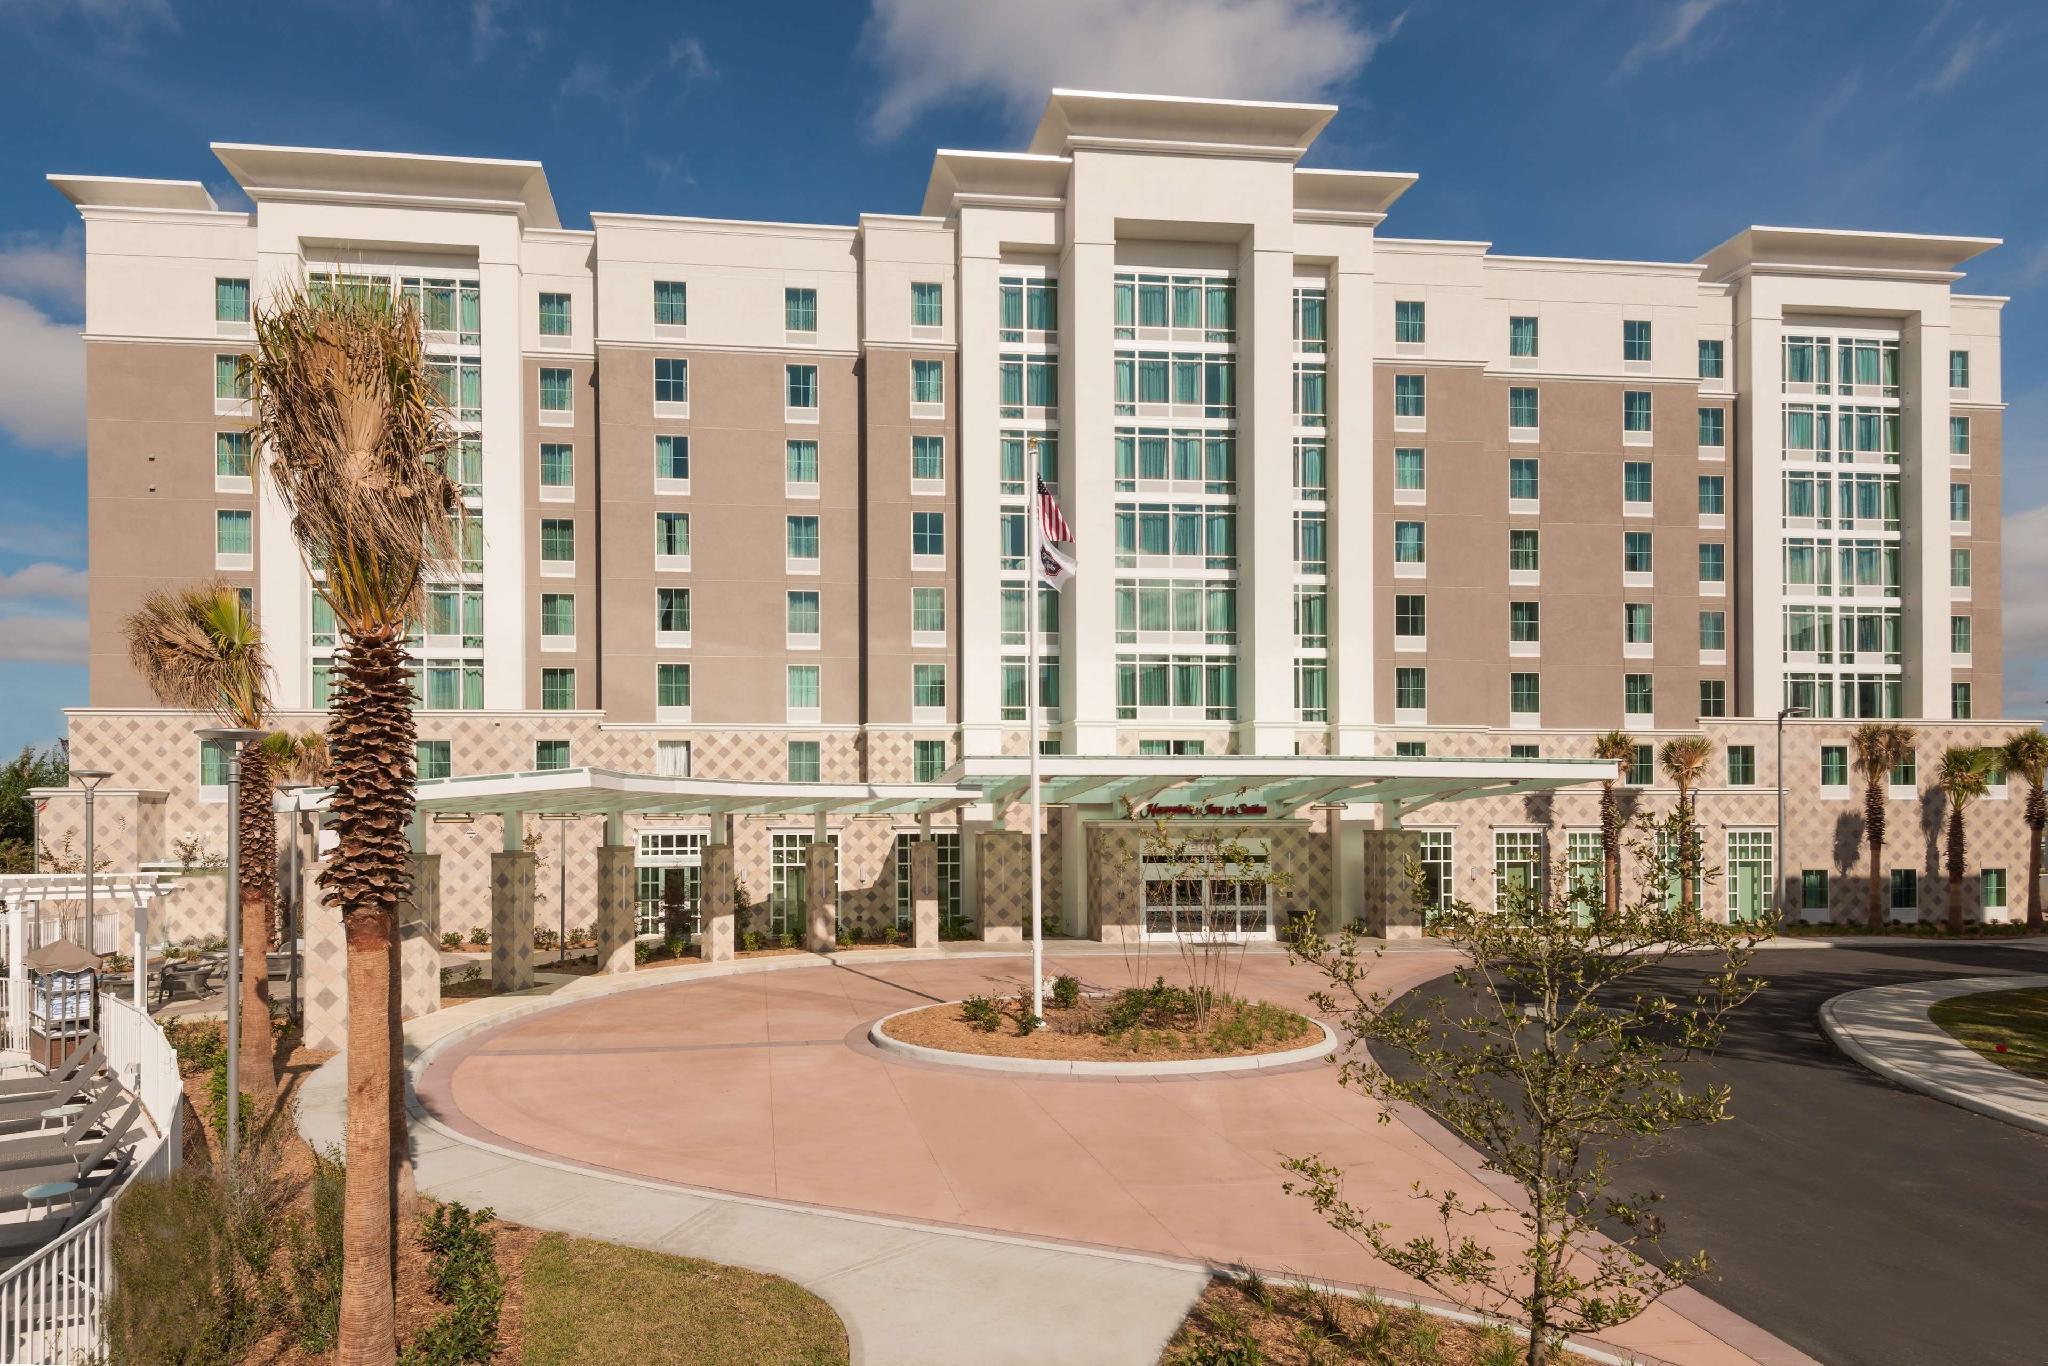 Hampton Inn And Suites Tampa Airport South @ Avion Park